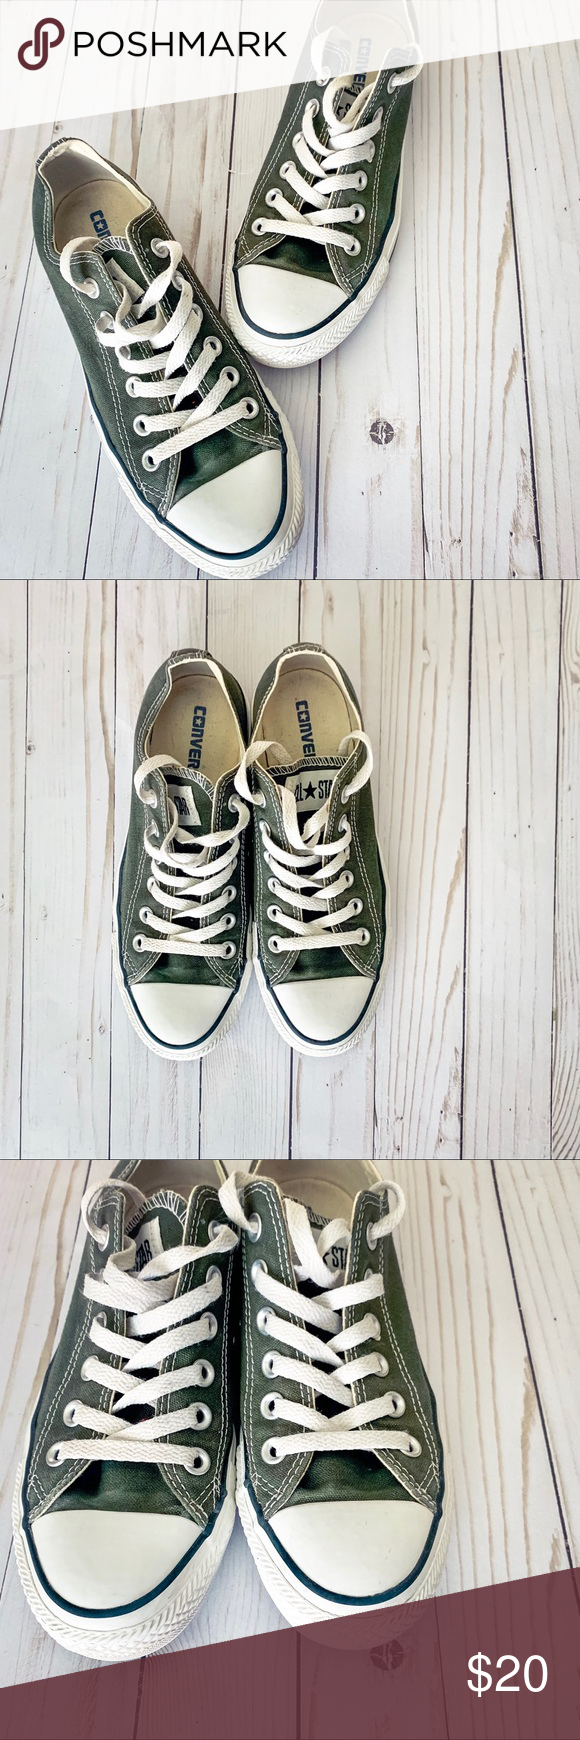 Converse Chuck Taylor All StarOlive Green | Olive green